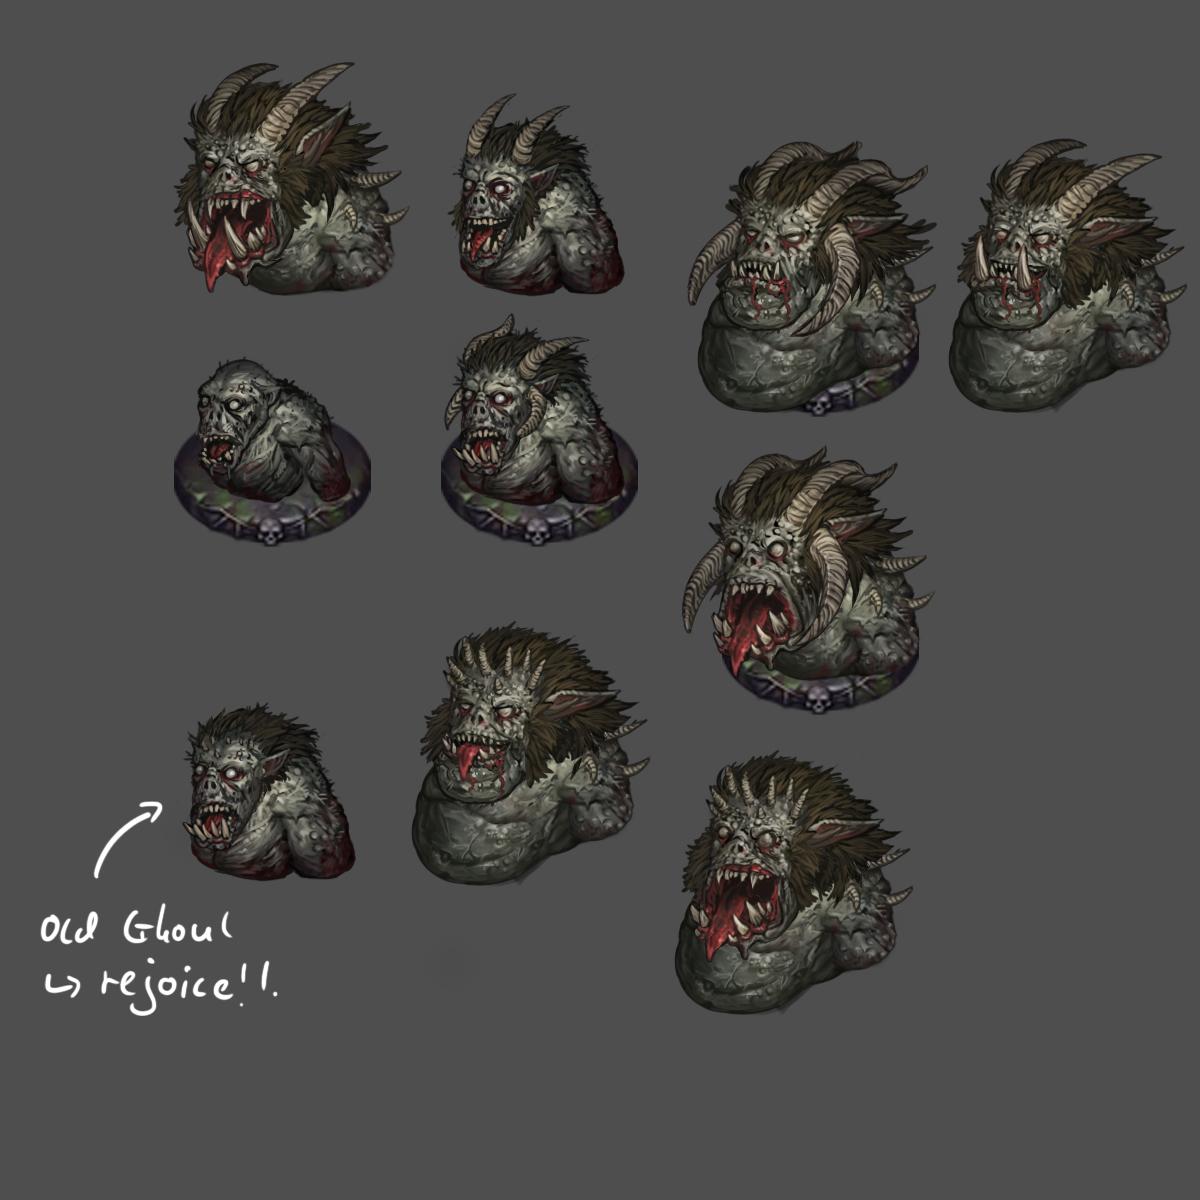 Ghoul variety